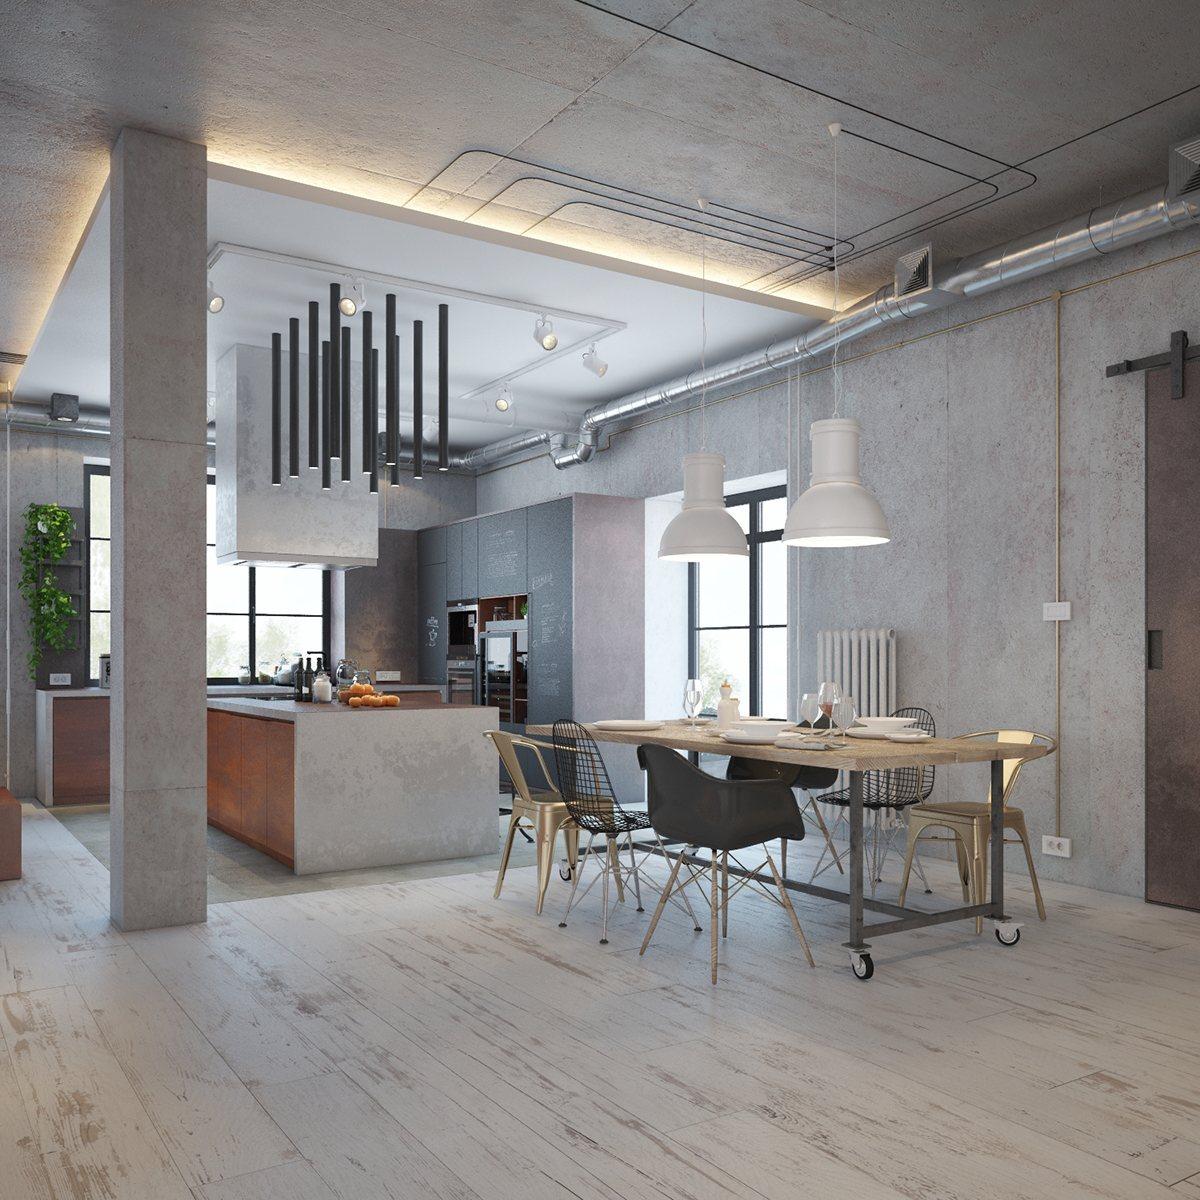 Industrial Home Design Spectacular Modern Industrial Home: Industrial Style Dining Room Design: The Essential Guide